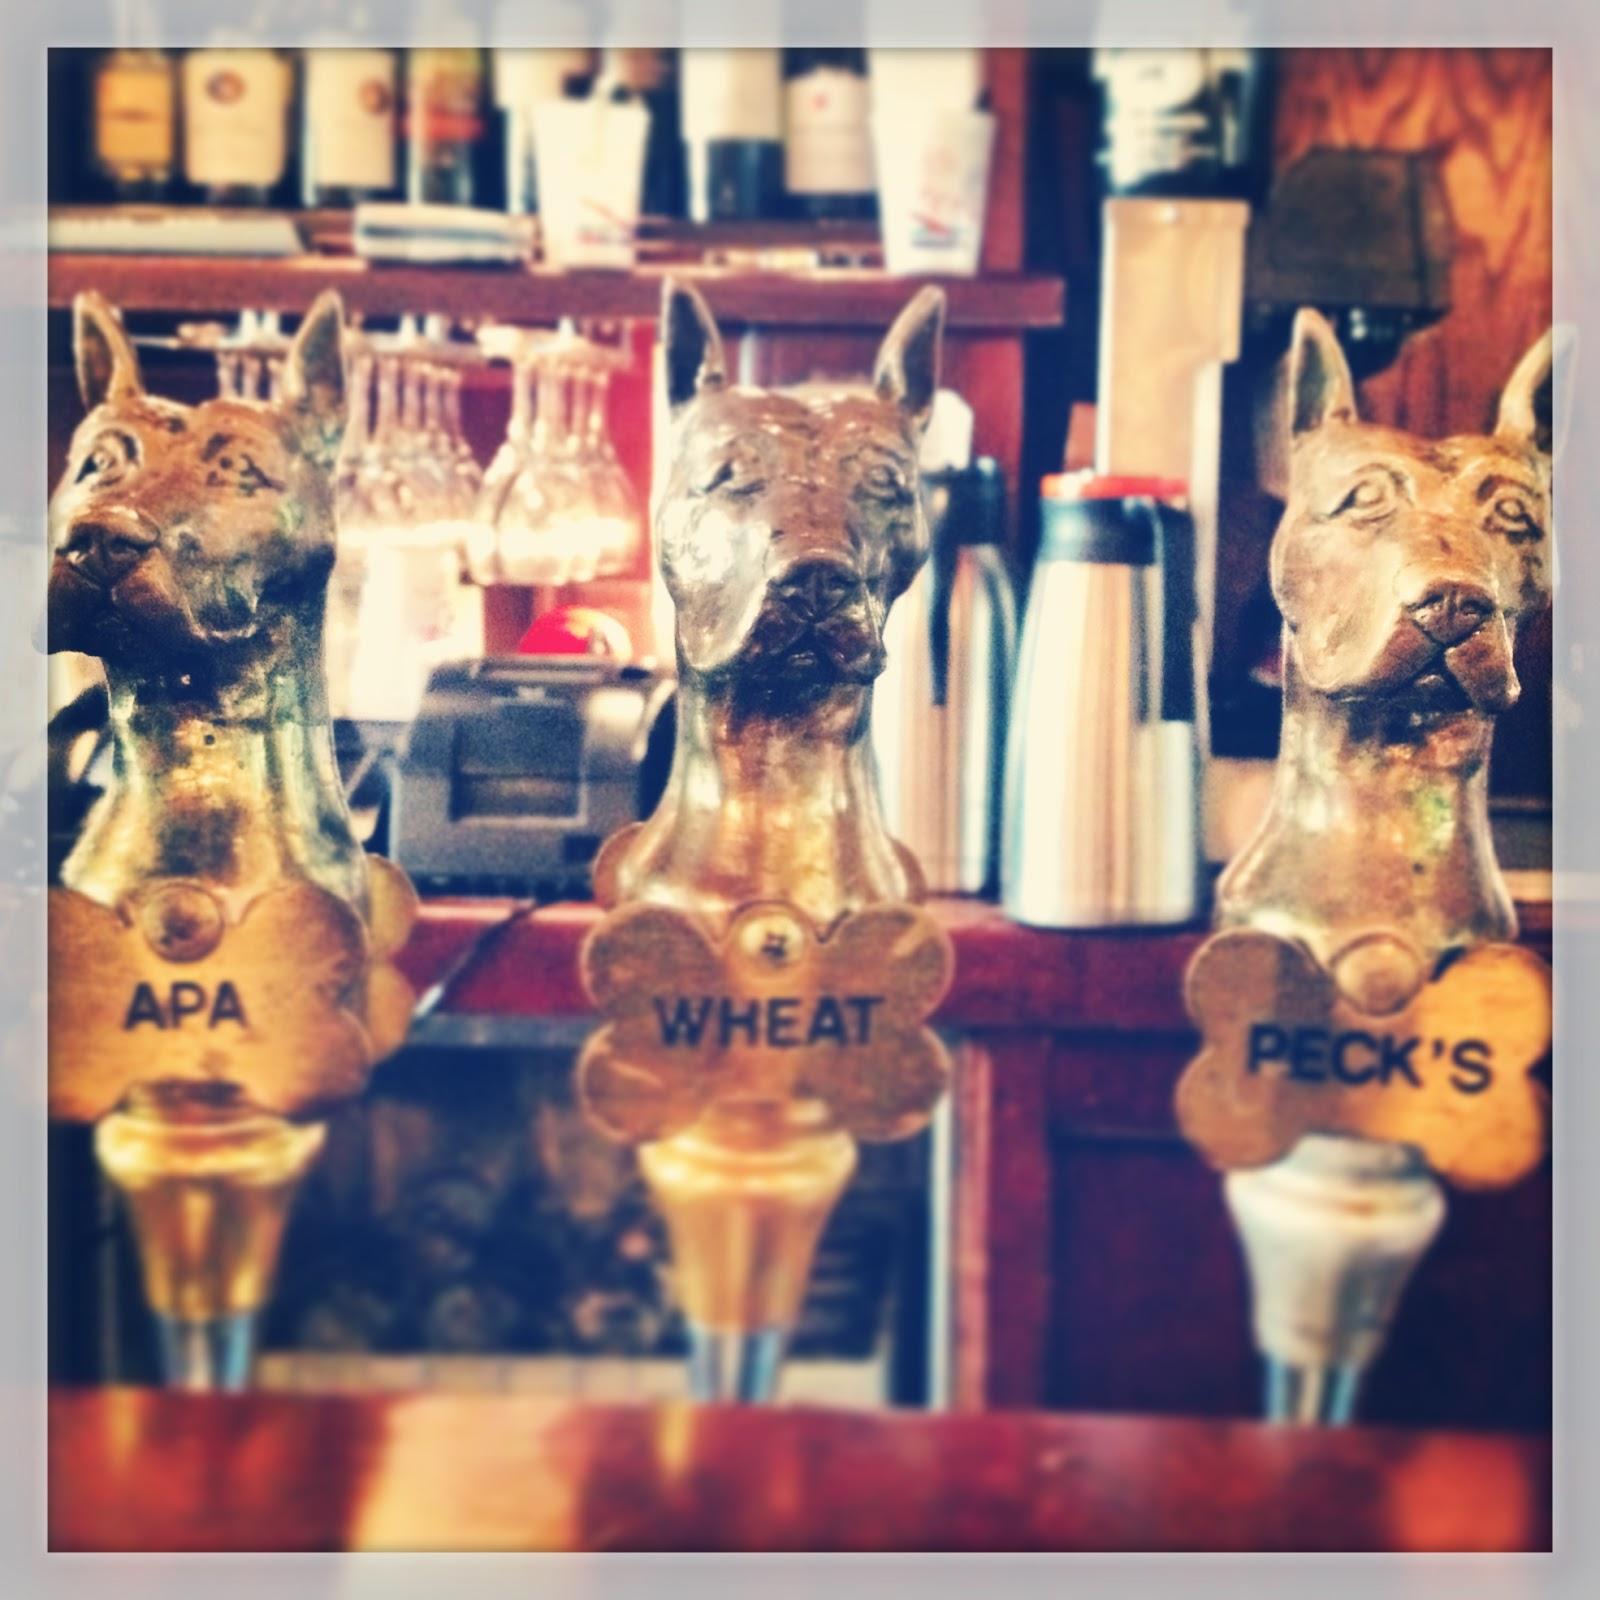 madison, wisconin : the great dane pub & brewing company